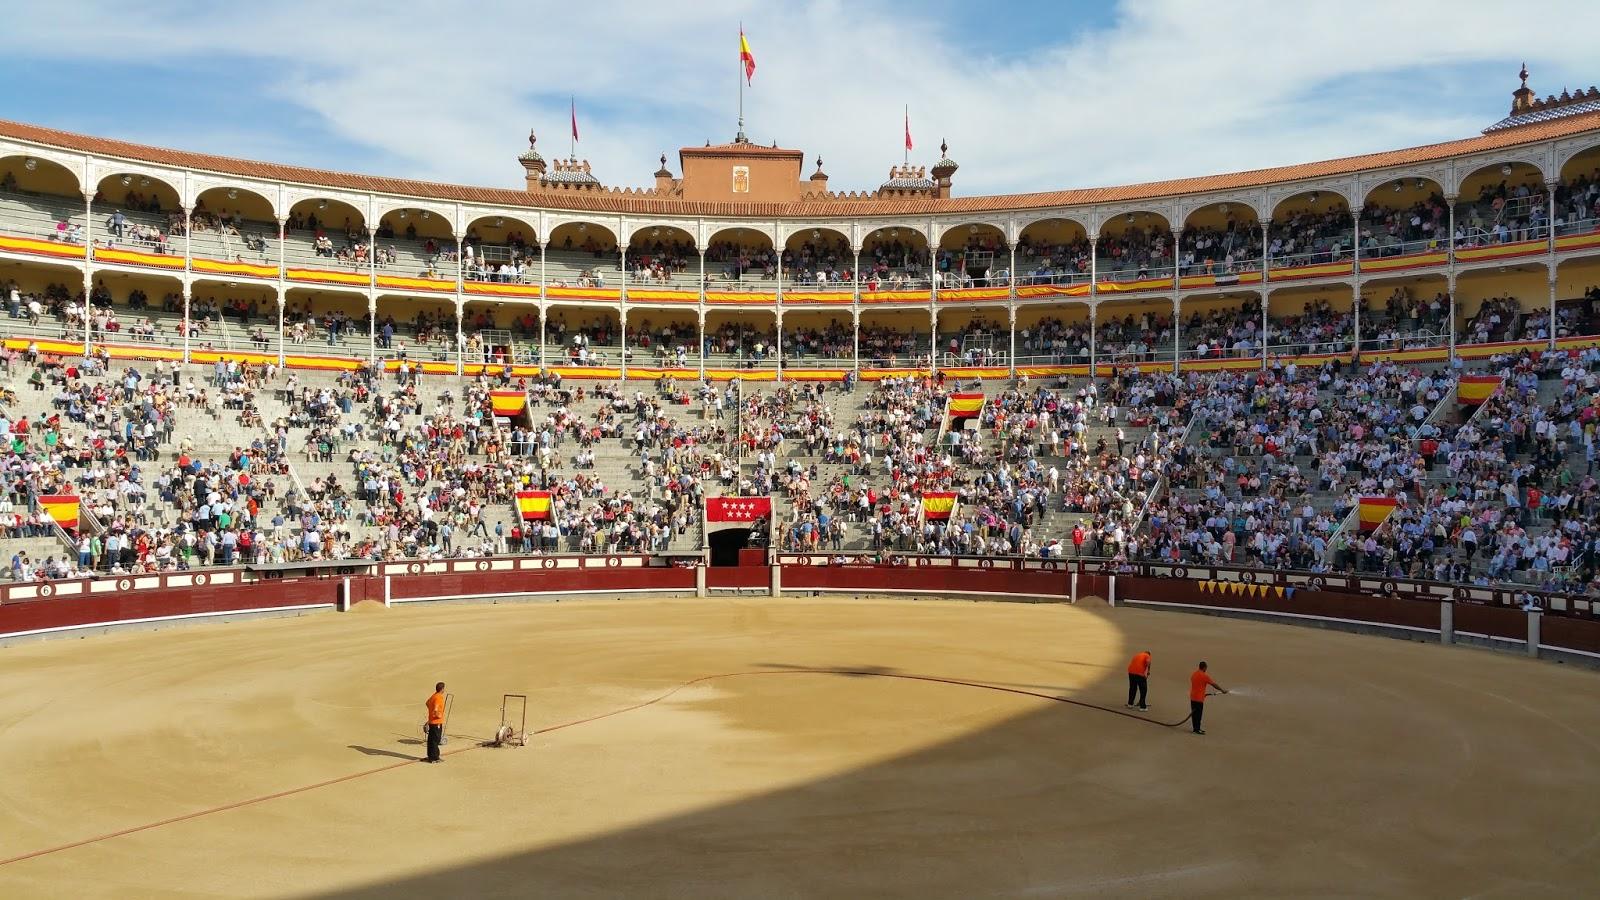 Del toro al infinito: El Dunquerque de Victorino / Por Paco Mora  #9A6D31 1600x900